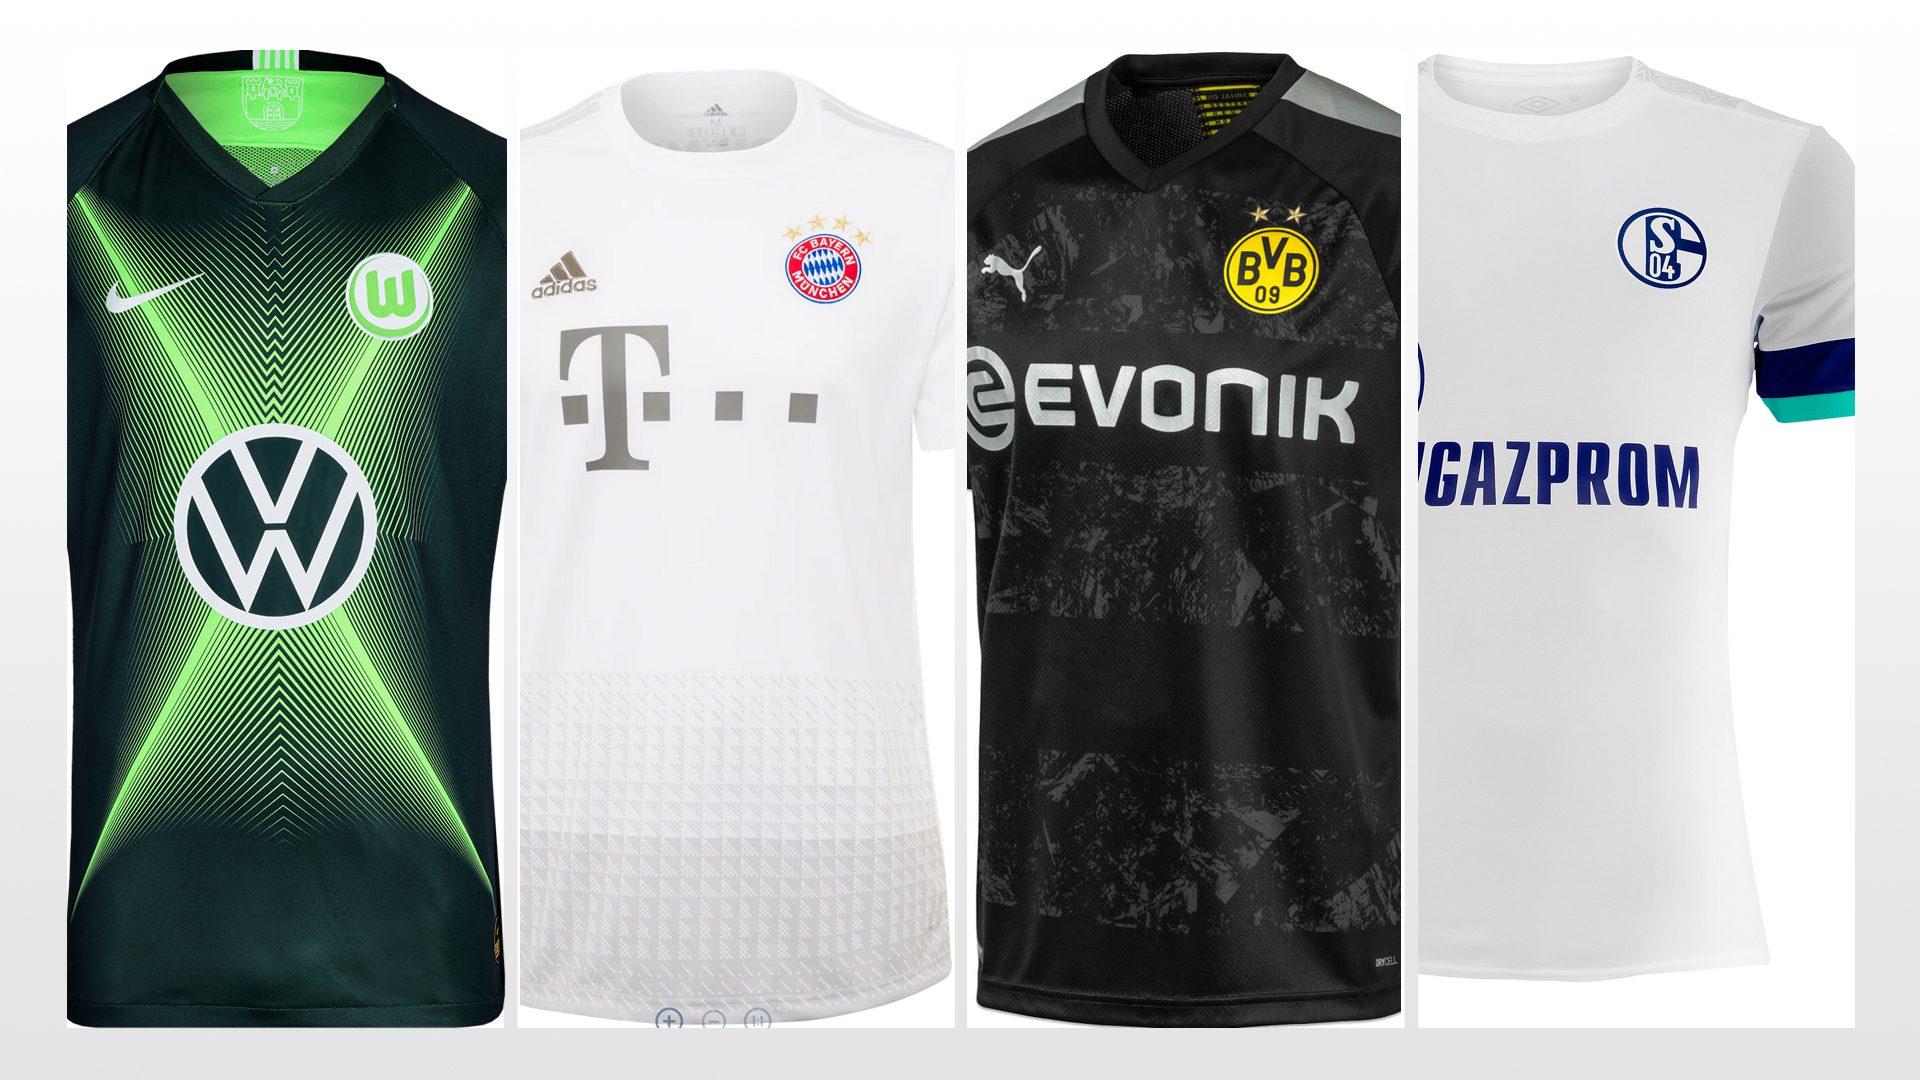 The new 2019/20 Bundesliga kits